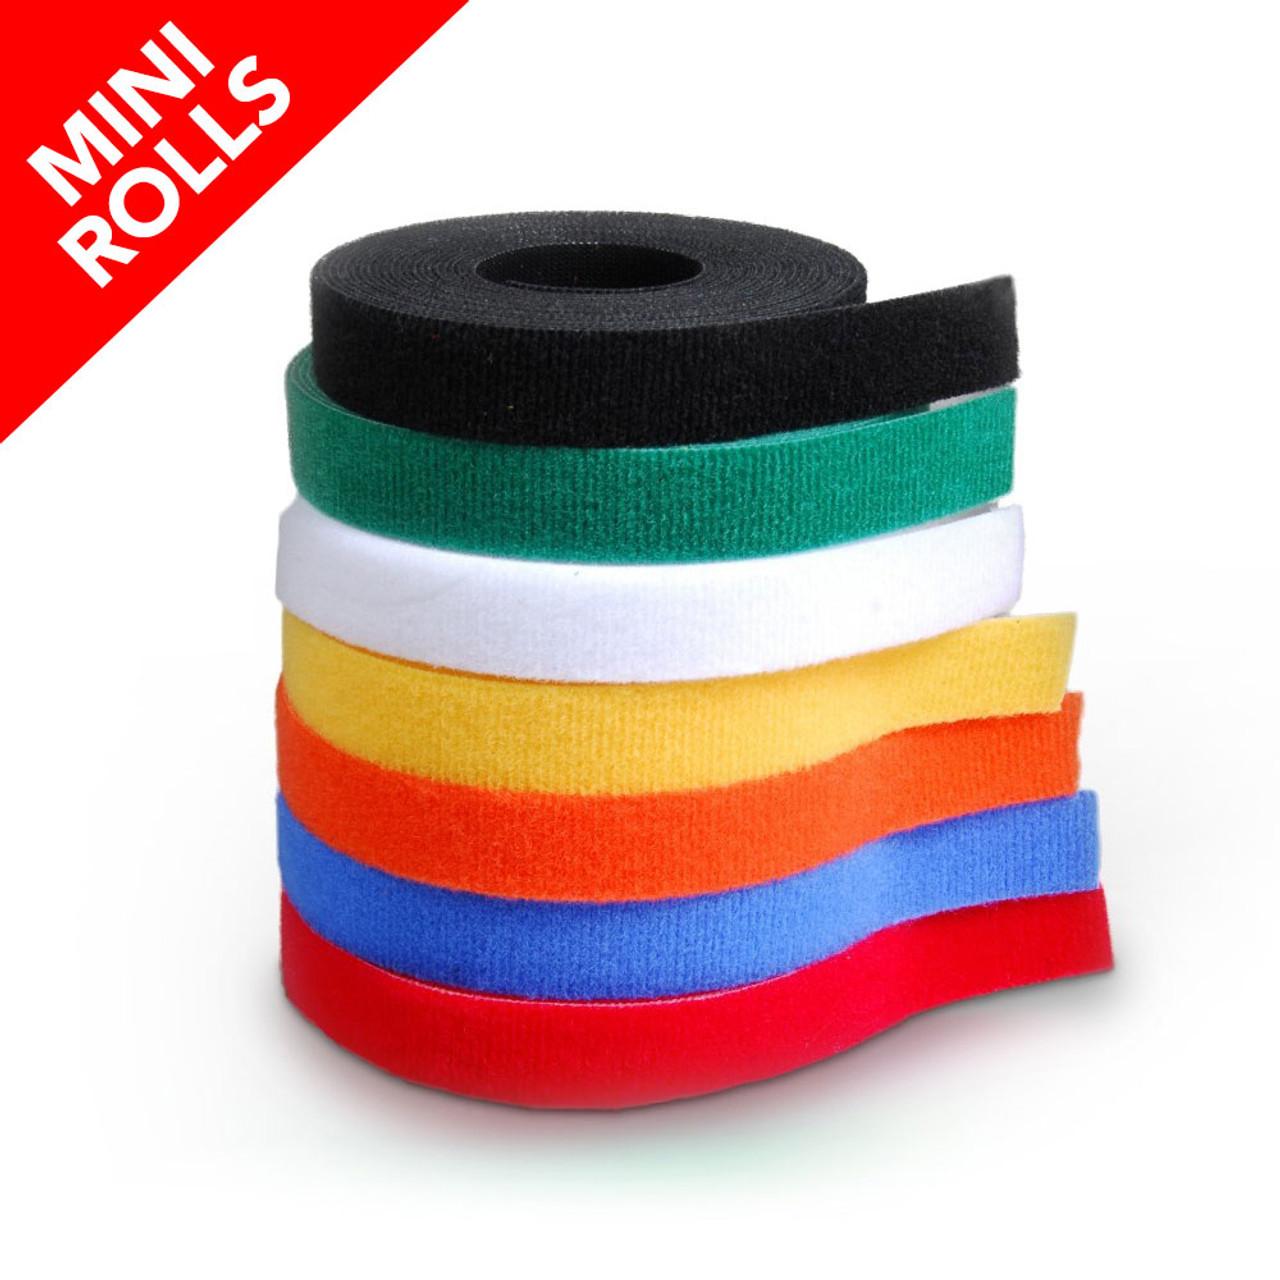 VELCRO® Brand ONE-WRAP® Tape Mini Rolls / Velcro Straps - Bundling Straps - Velcro Tie - Velcro Strap